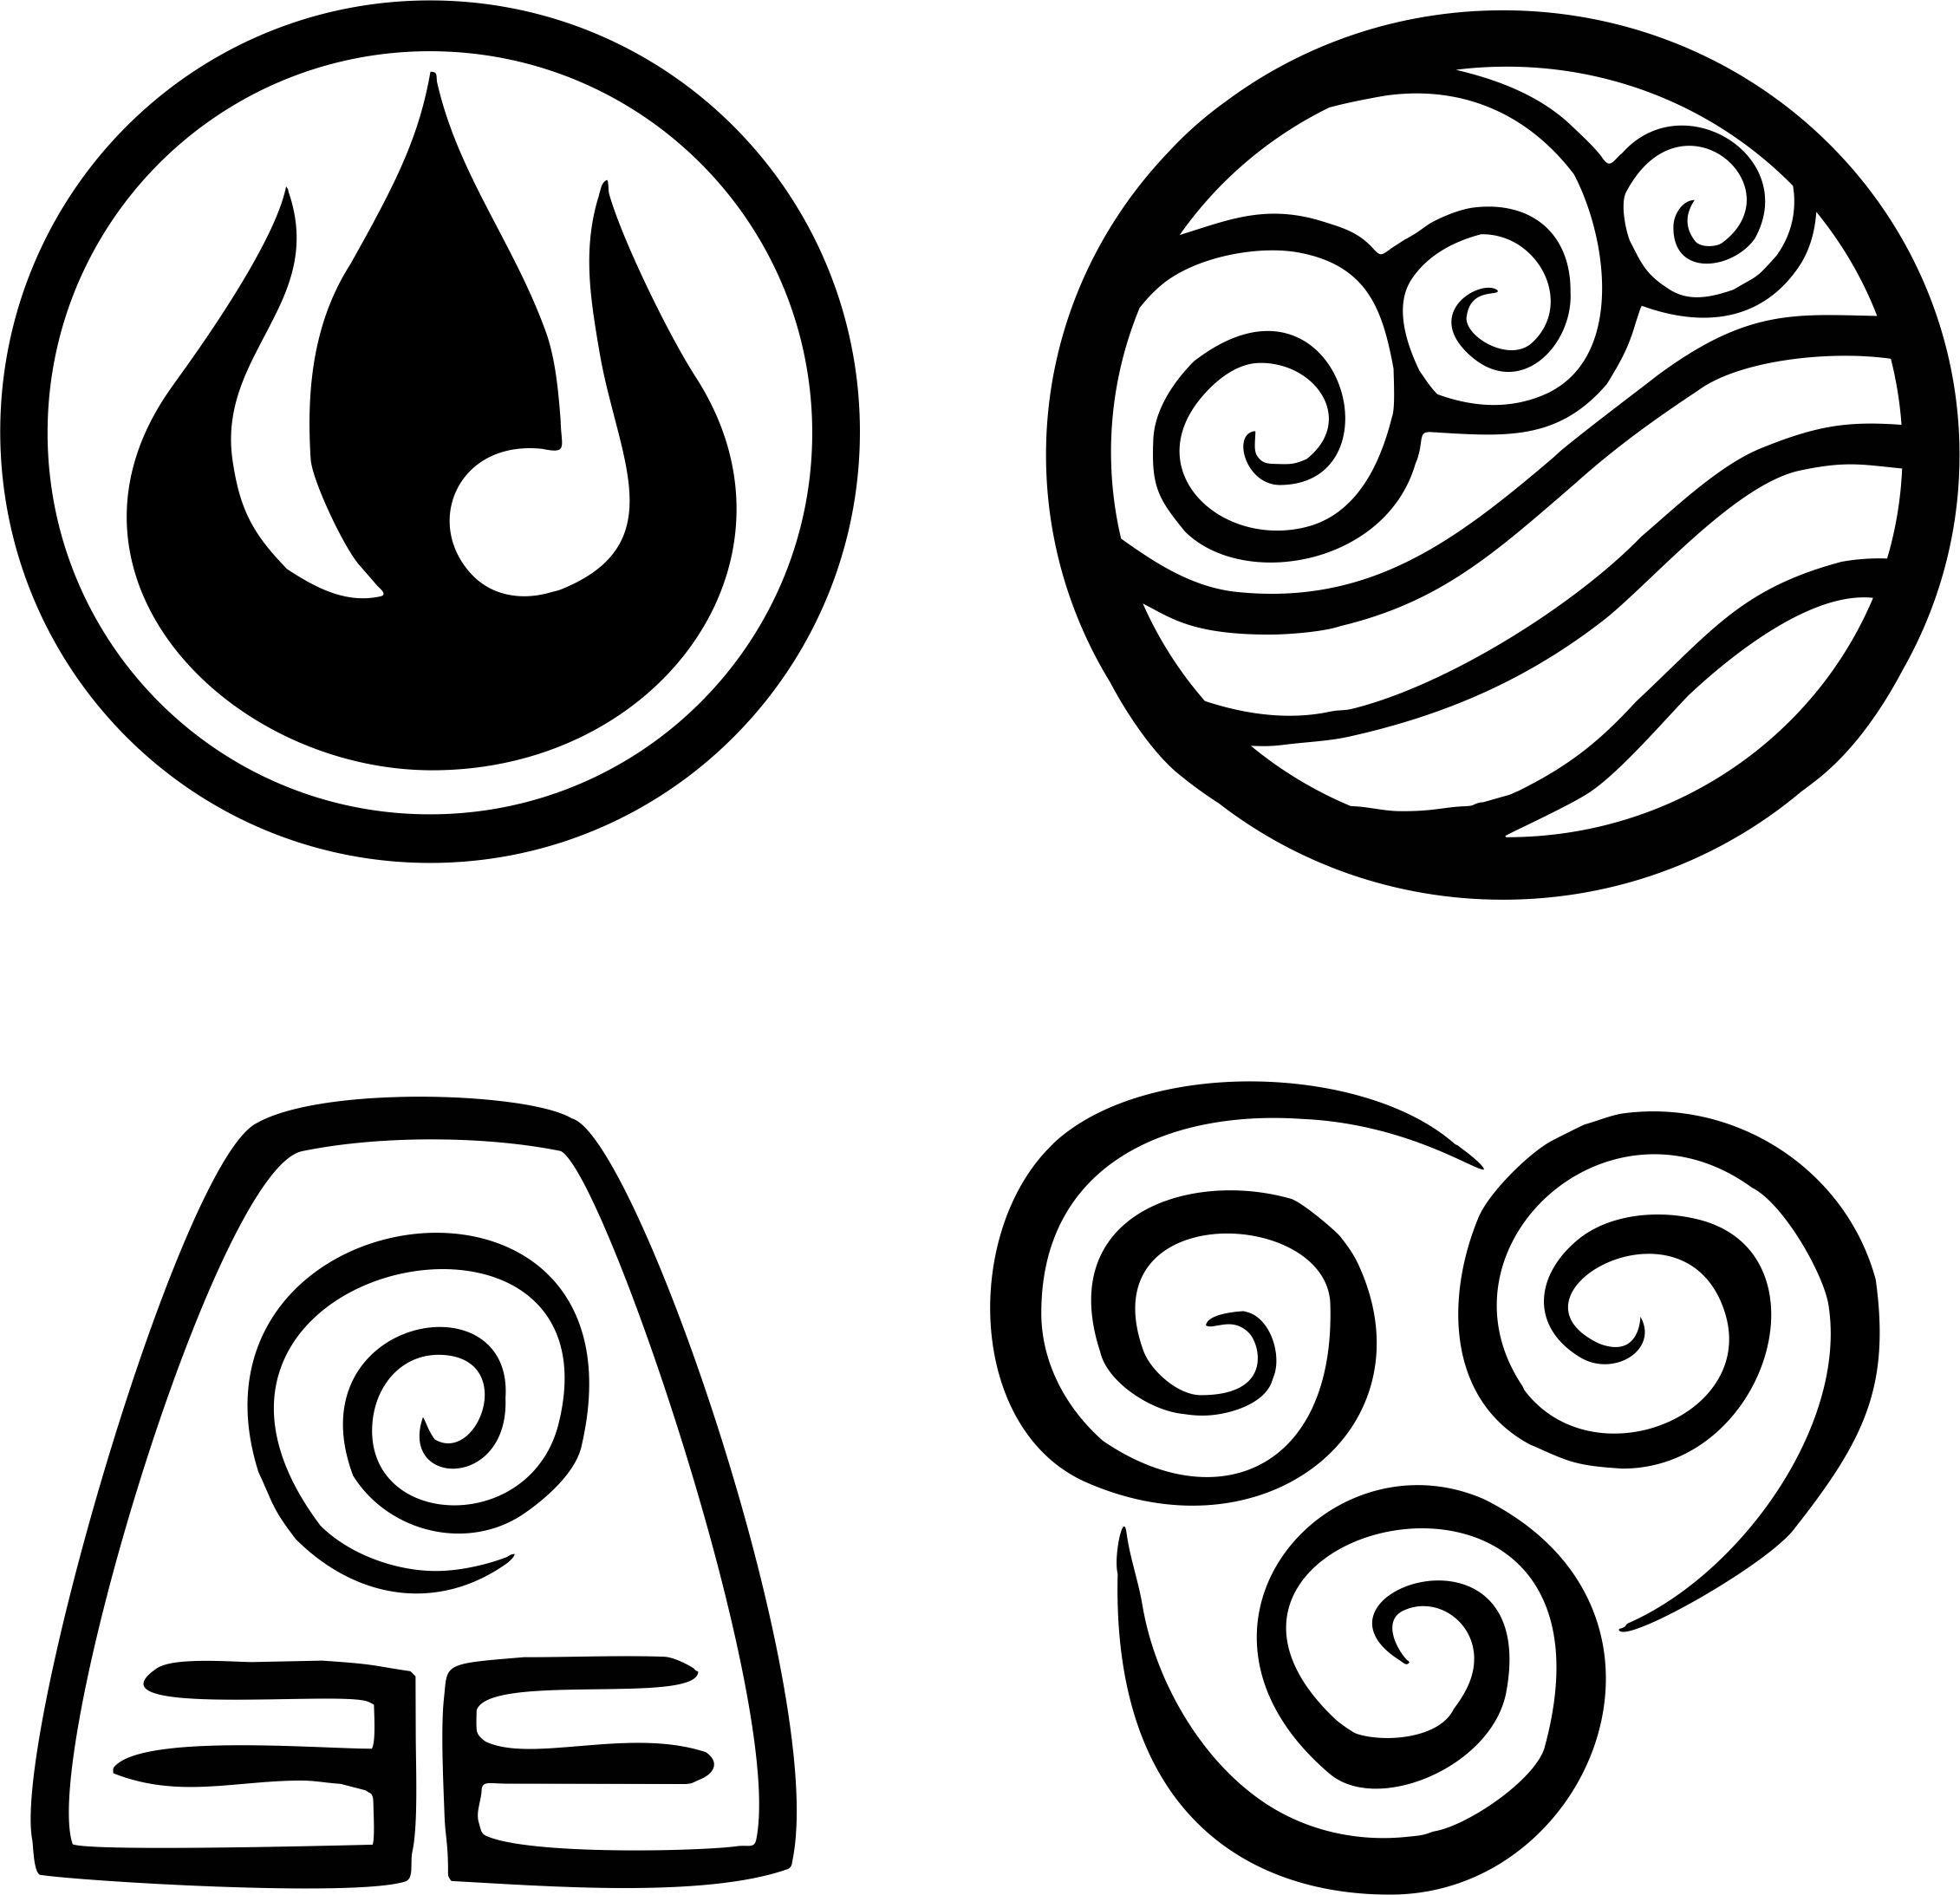 Avatar 4: Avatar The Last Airbender Nation Symbols. Visit My Website